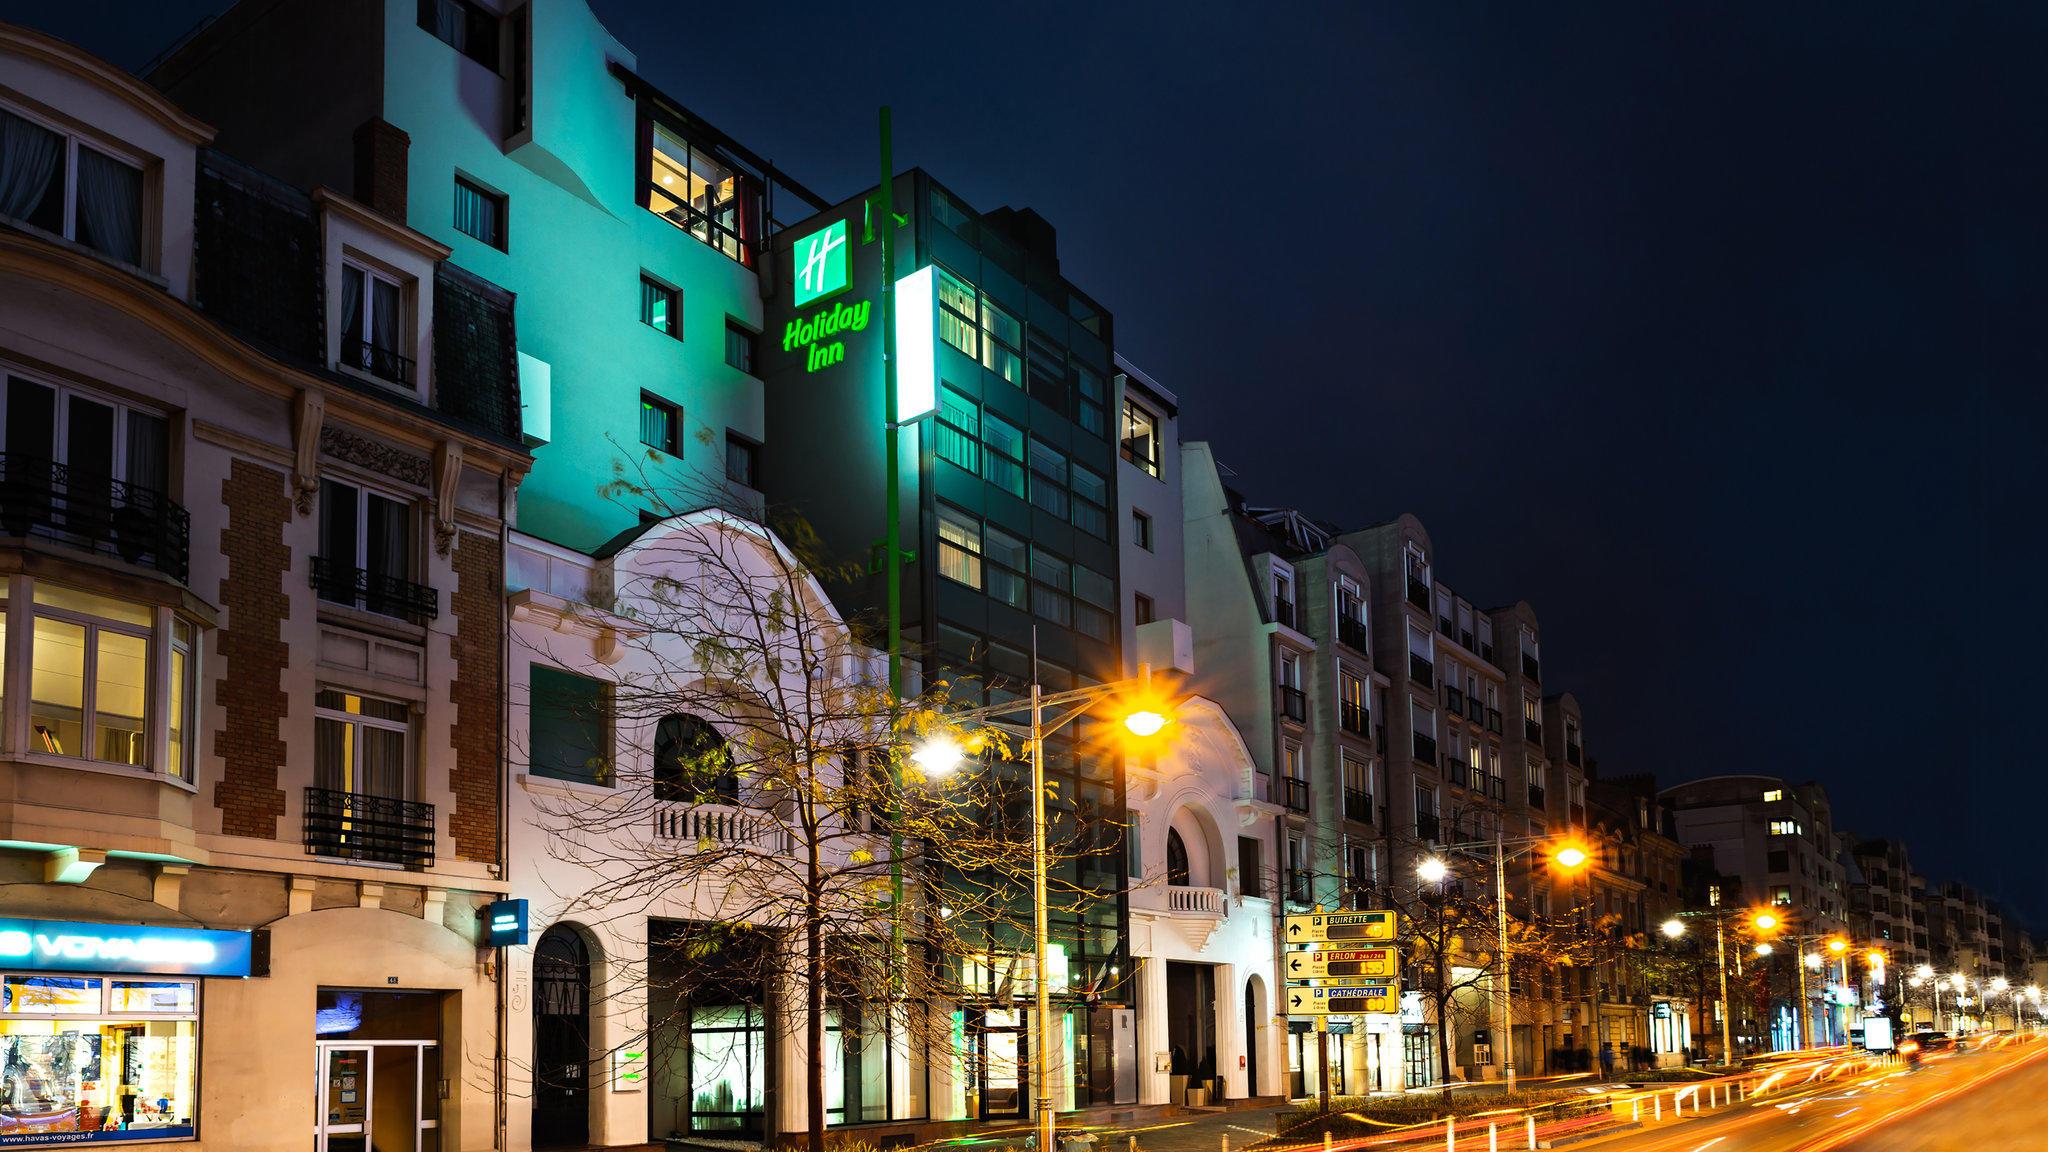 Holiday Inn Reims - City Centre, an IHG Hotel